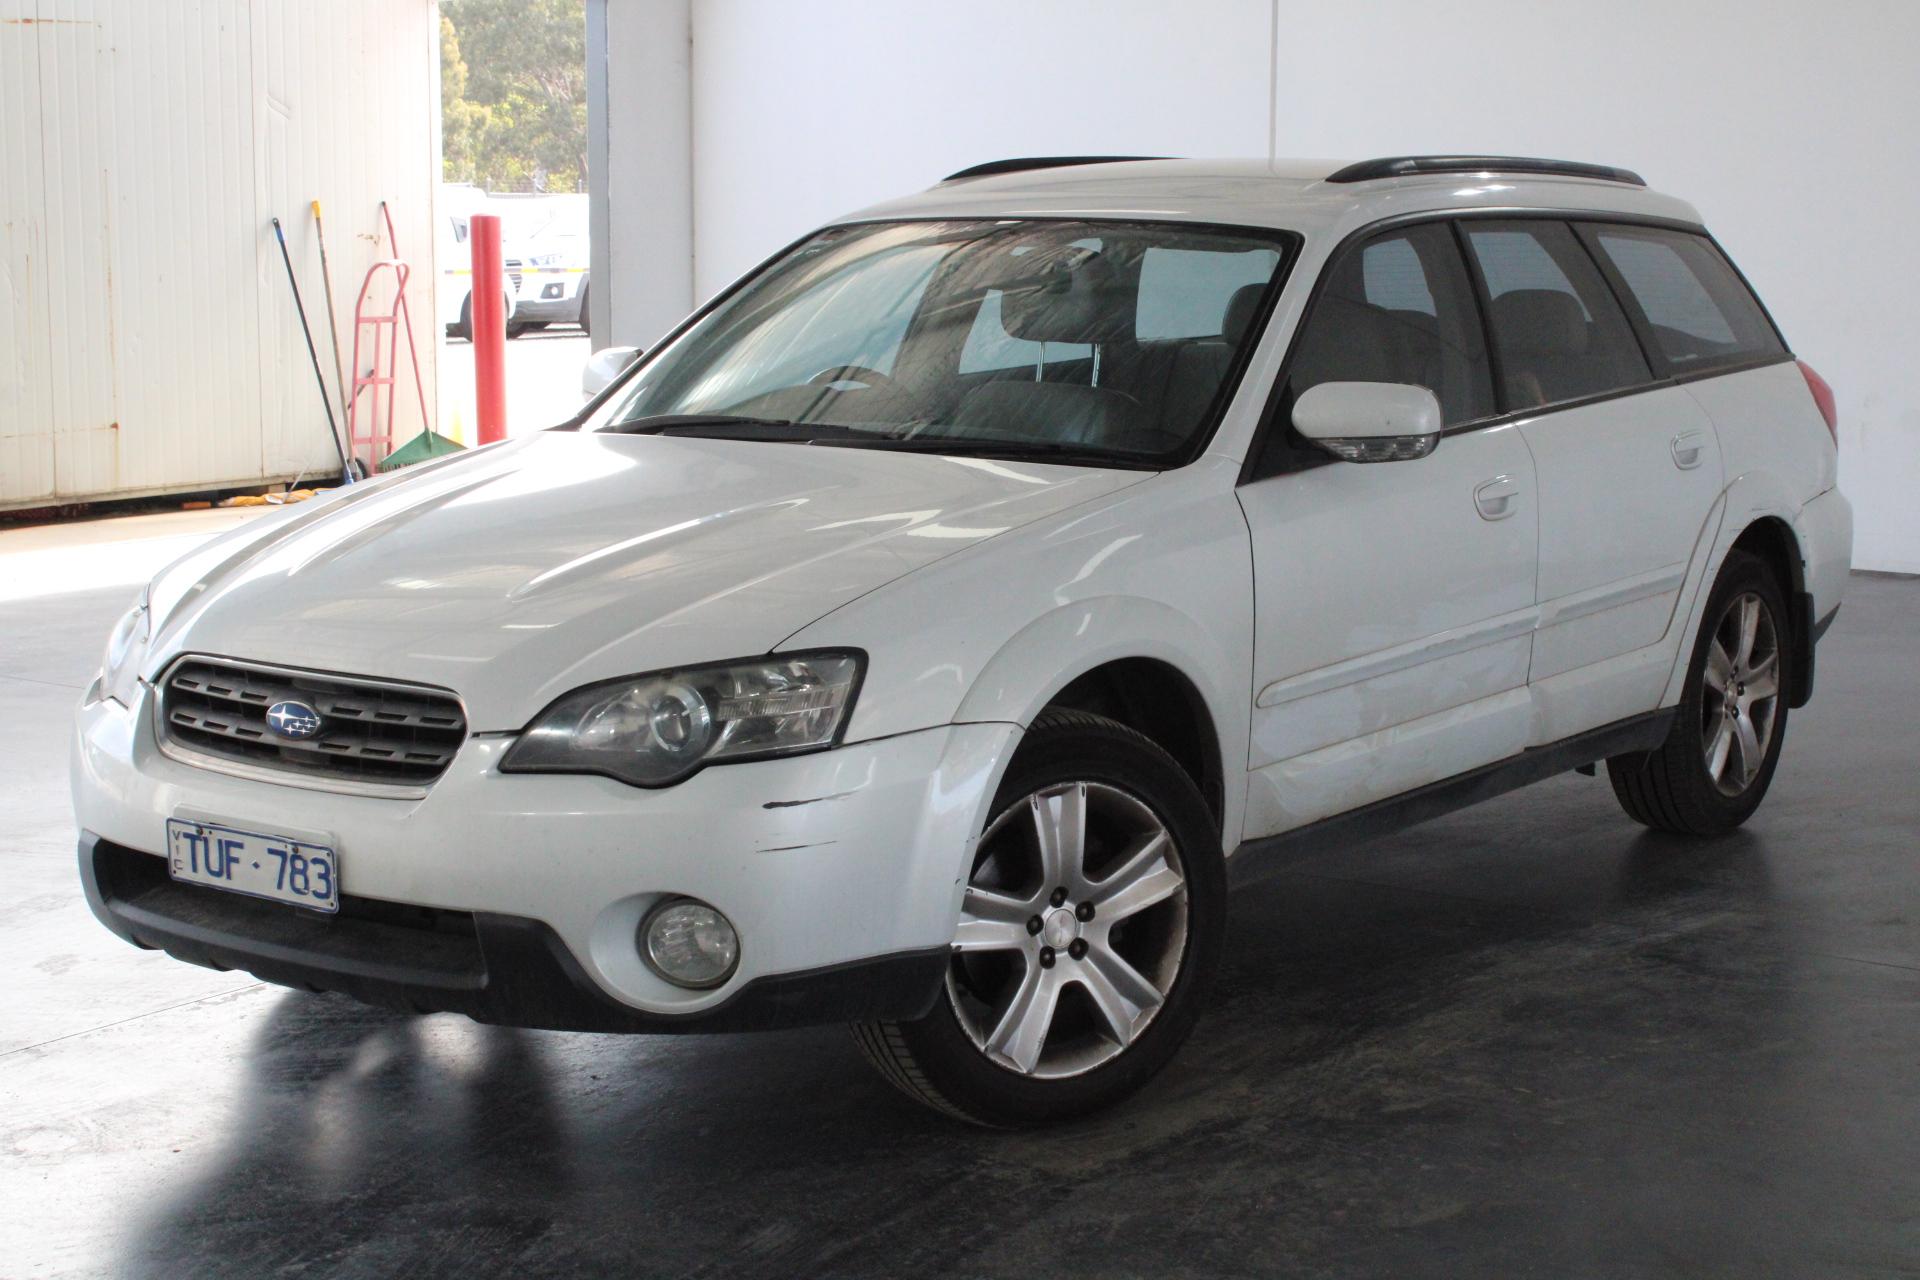 2004 Subaru Outback 3.0R B4A Automatic Wagon